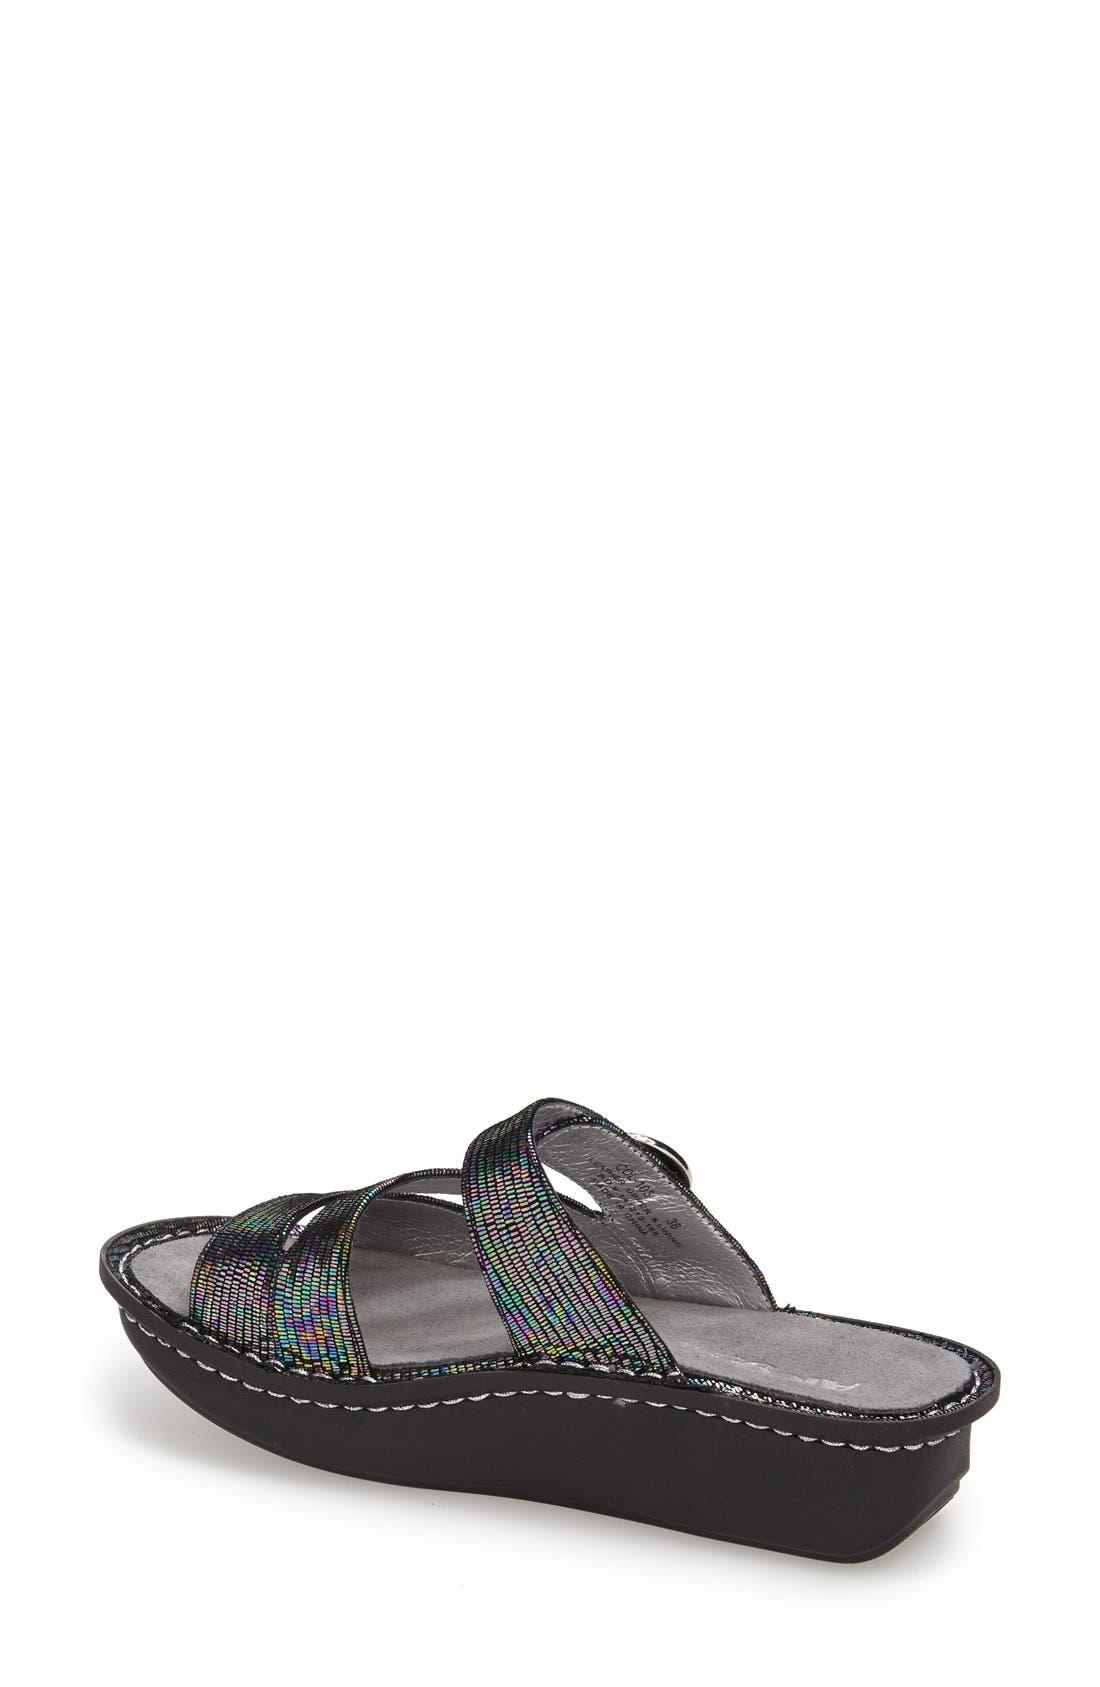 'Colette' Platform Sandal,                             Alternate thumbnail 42, color,